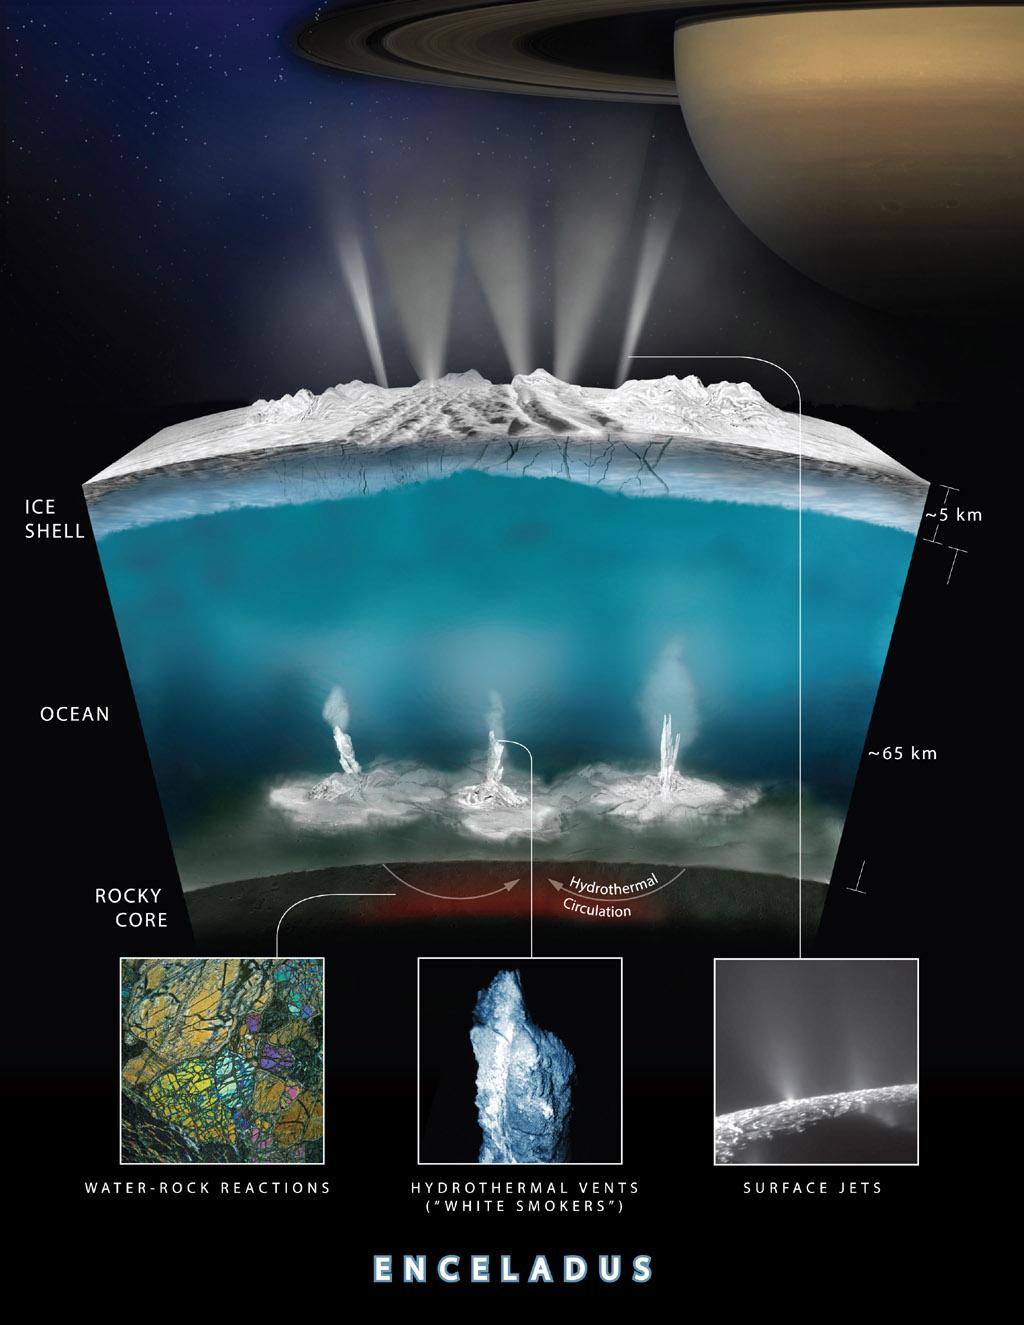 enceladus_layout_4_10